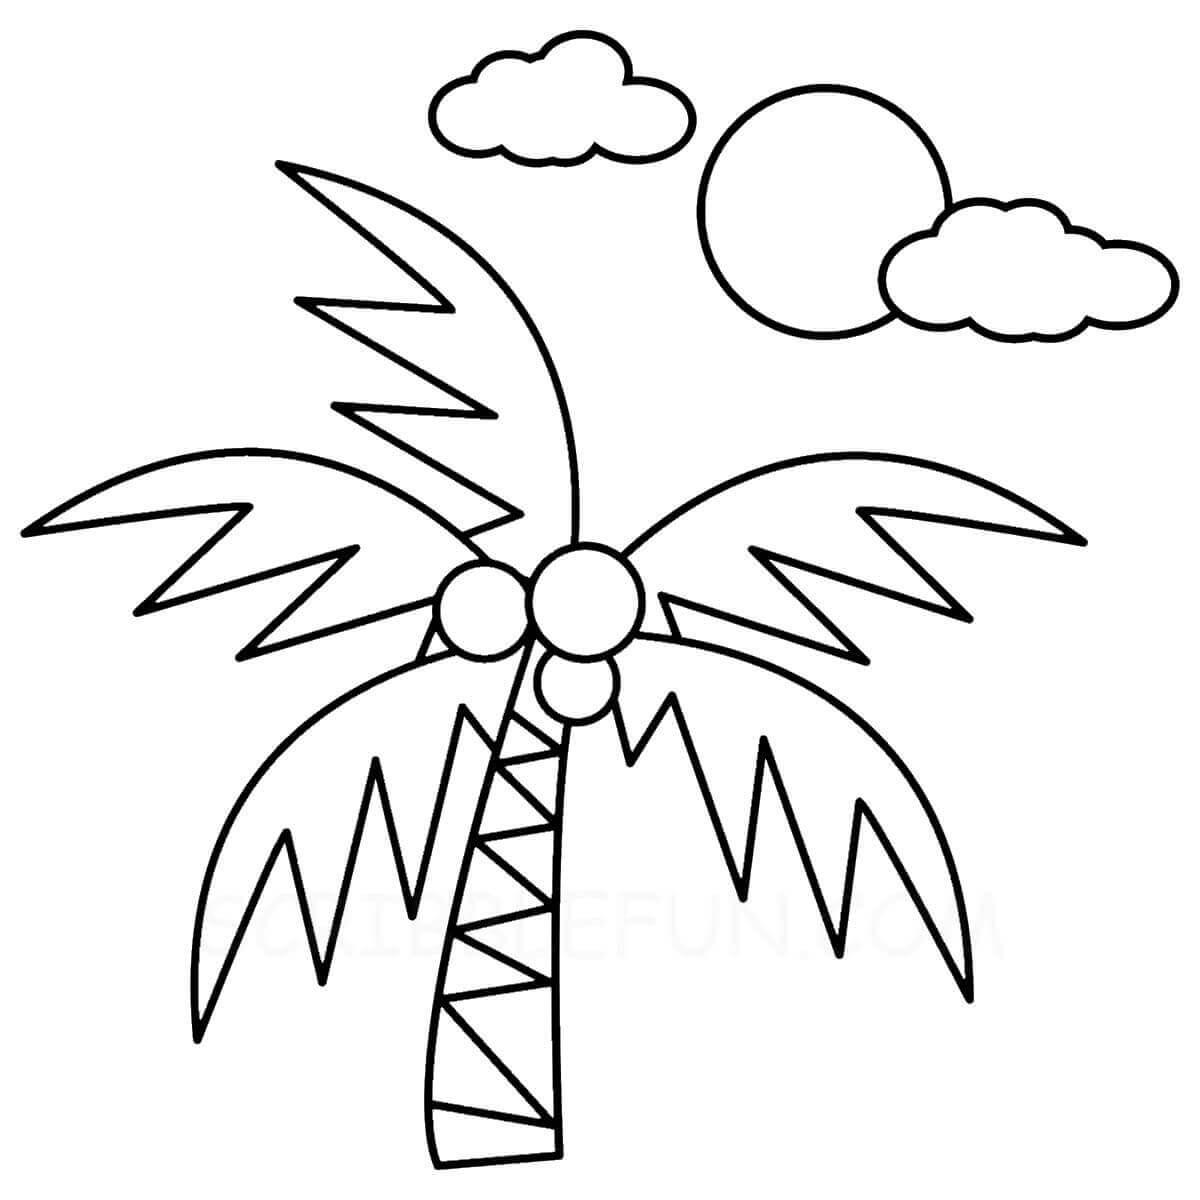 Coconut tree and sun